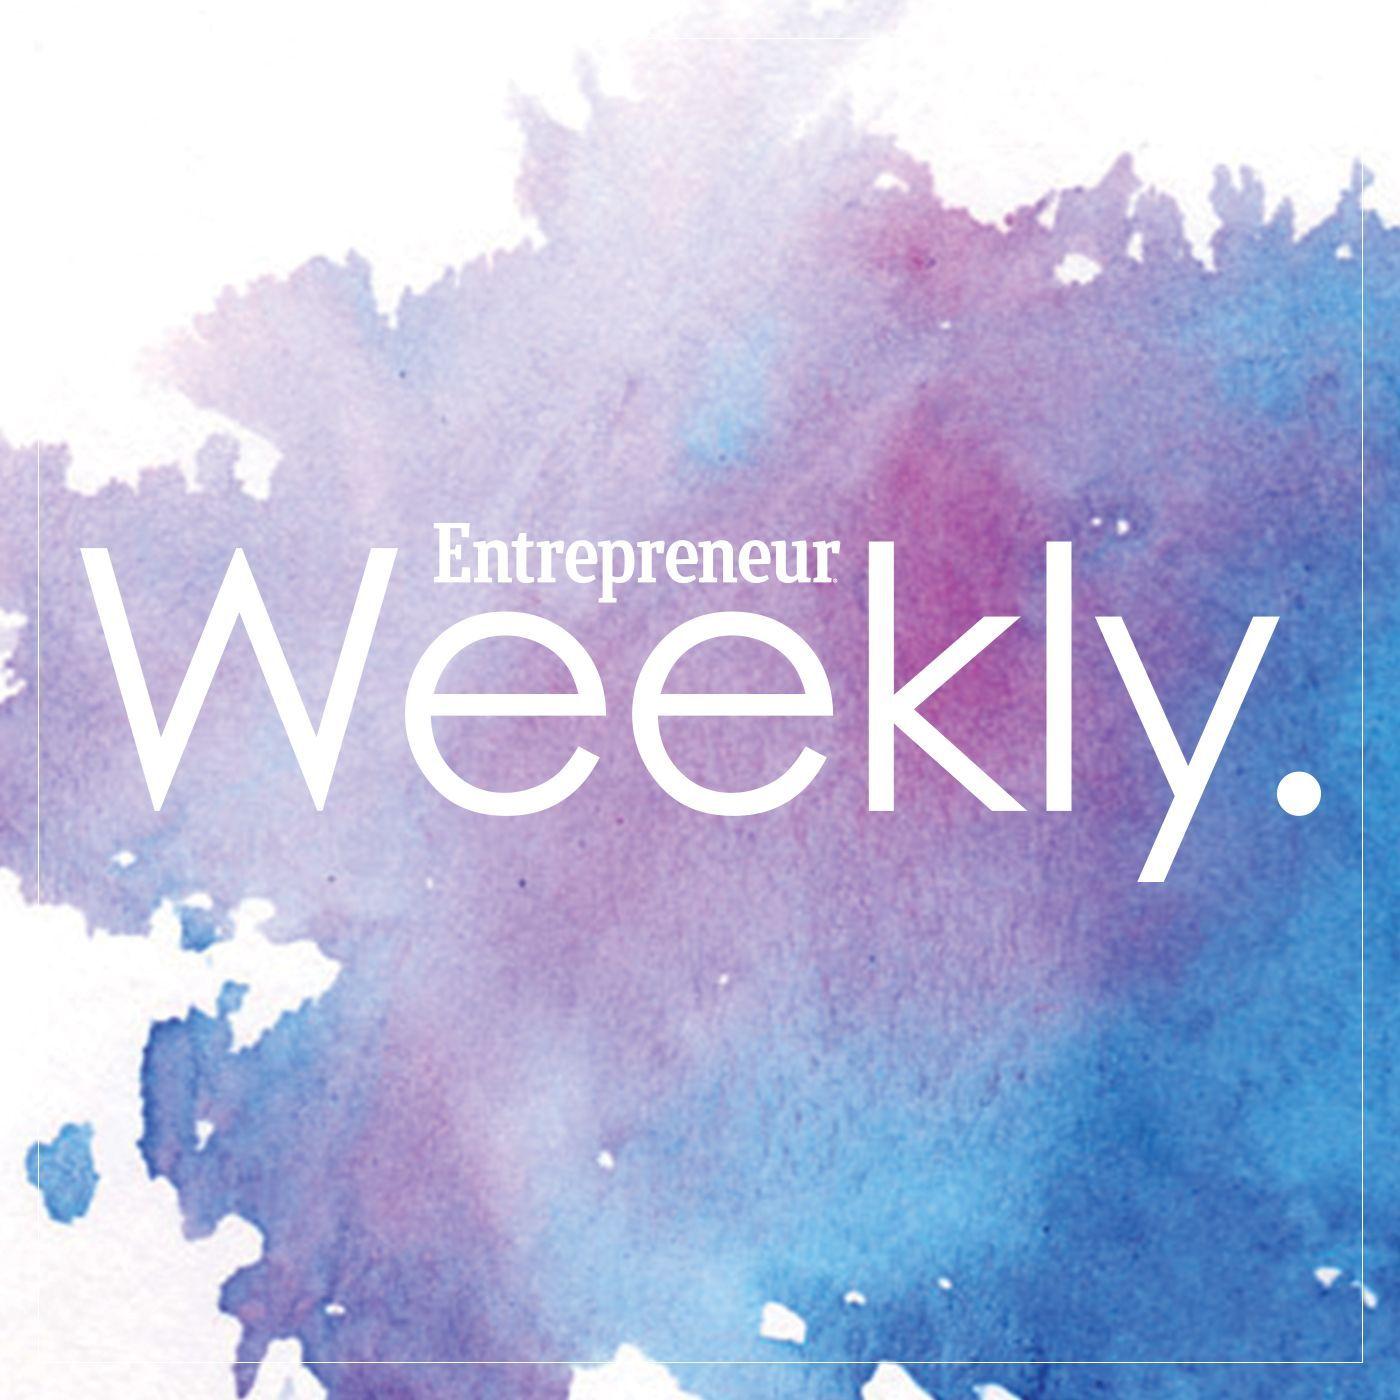 Heartland Newsfeed Radio Network: Entrepreneur Weekly (October 10, 2019)